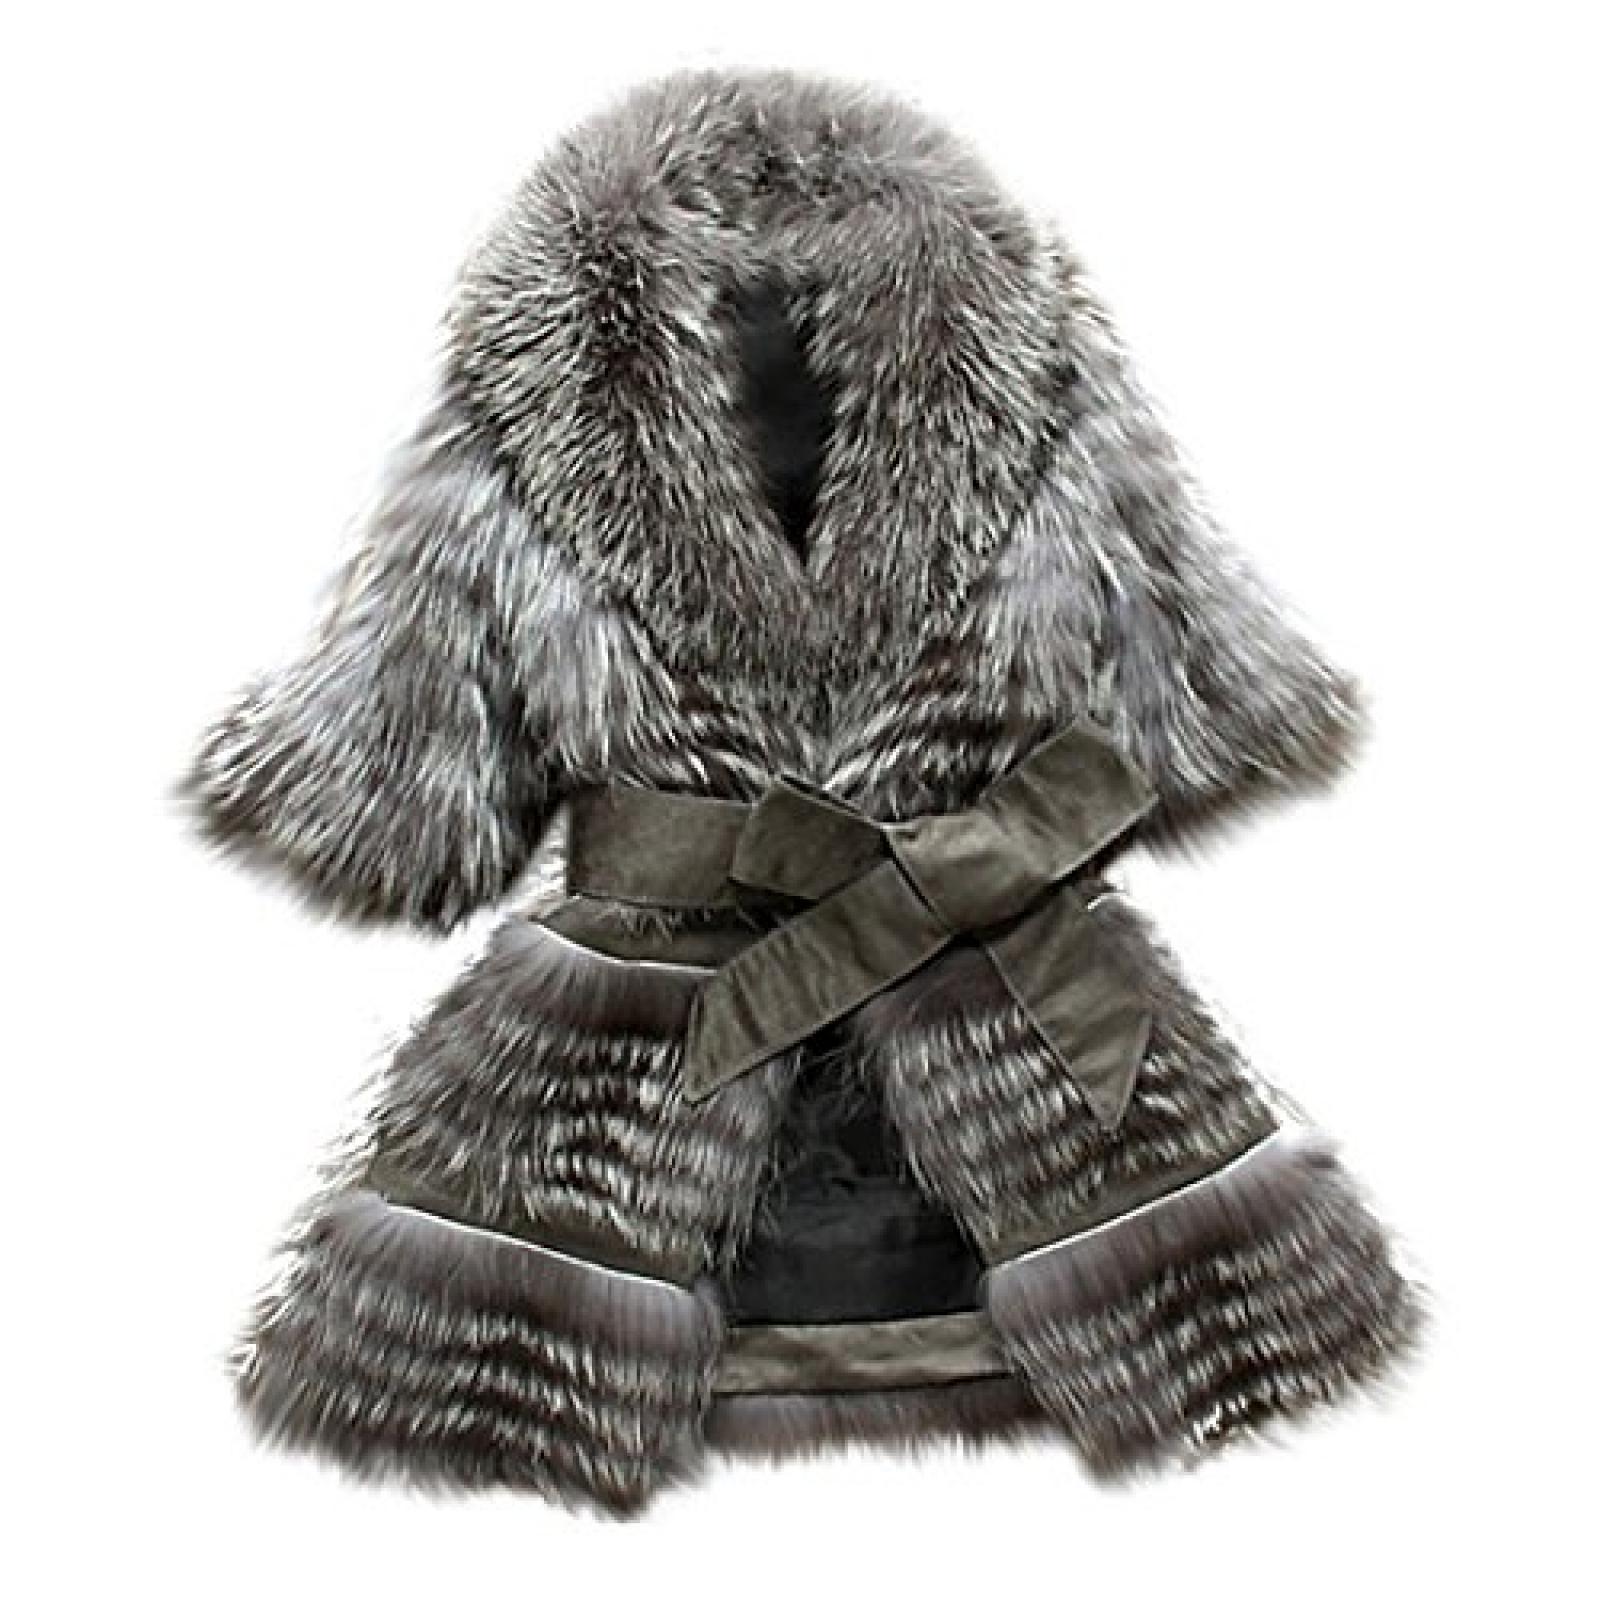 Imixlot Frauen Fuchspelz Mantel Jacke Weste/Vest Oberbekleidung